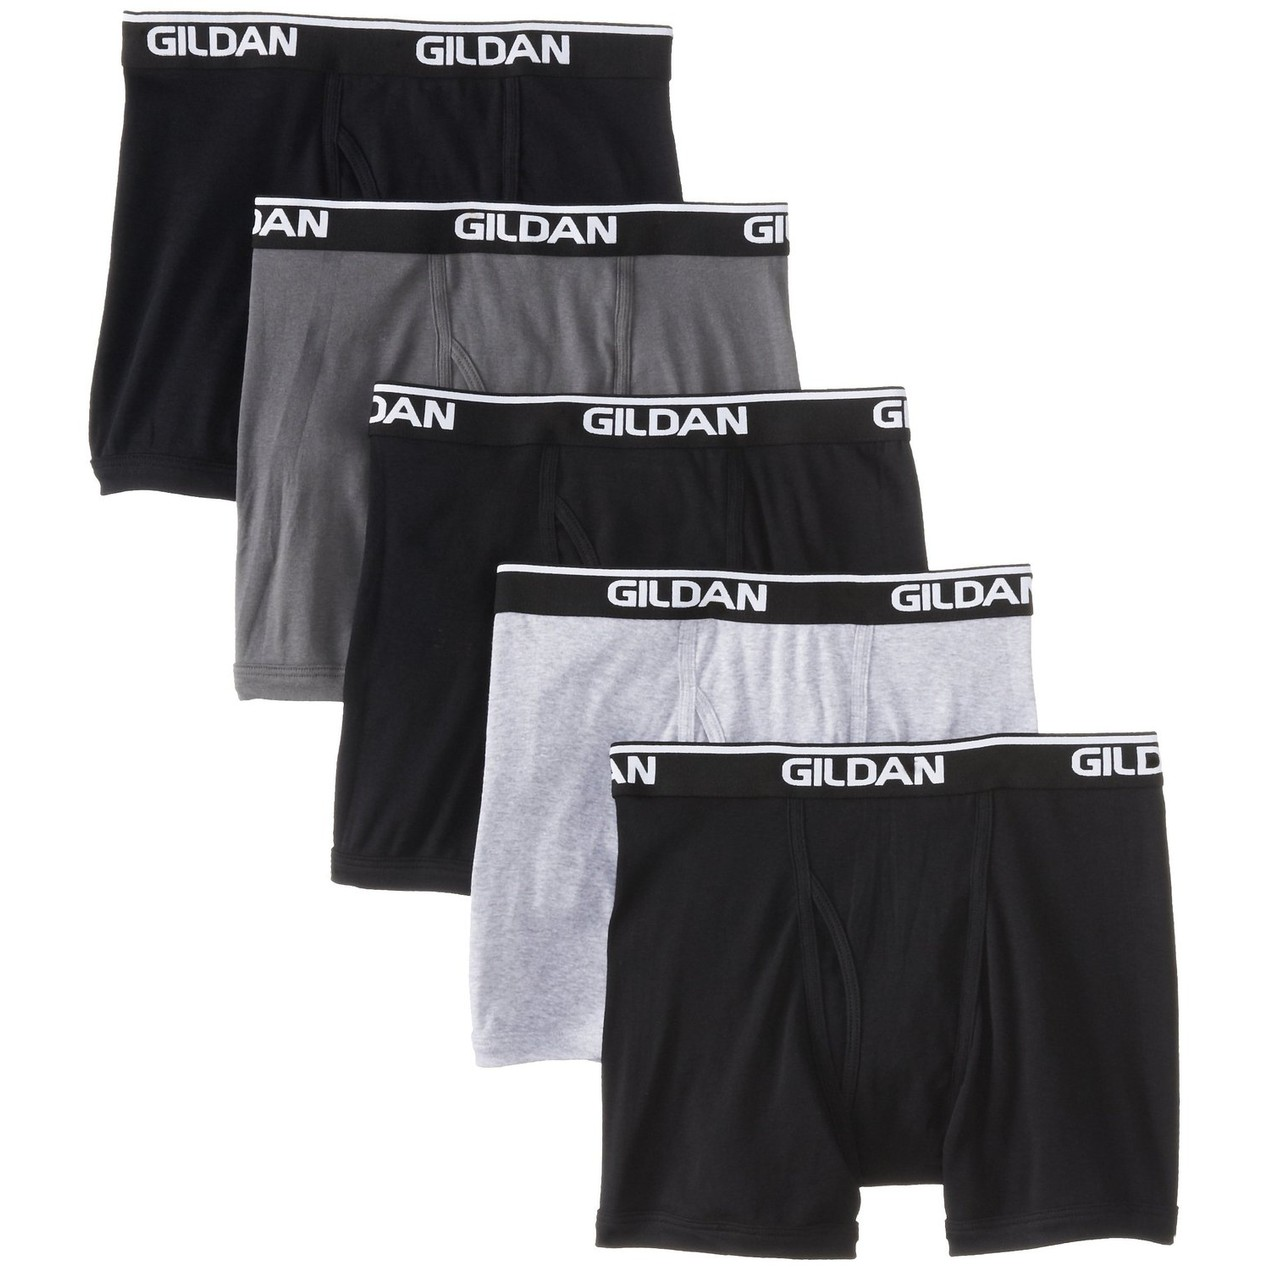 f7ab16cc3331 4-Pack: Gildan Men's 100% Ringspun Cotton Briefs - Tanga